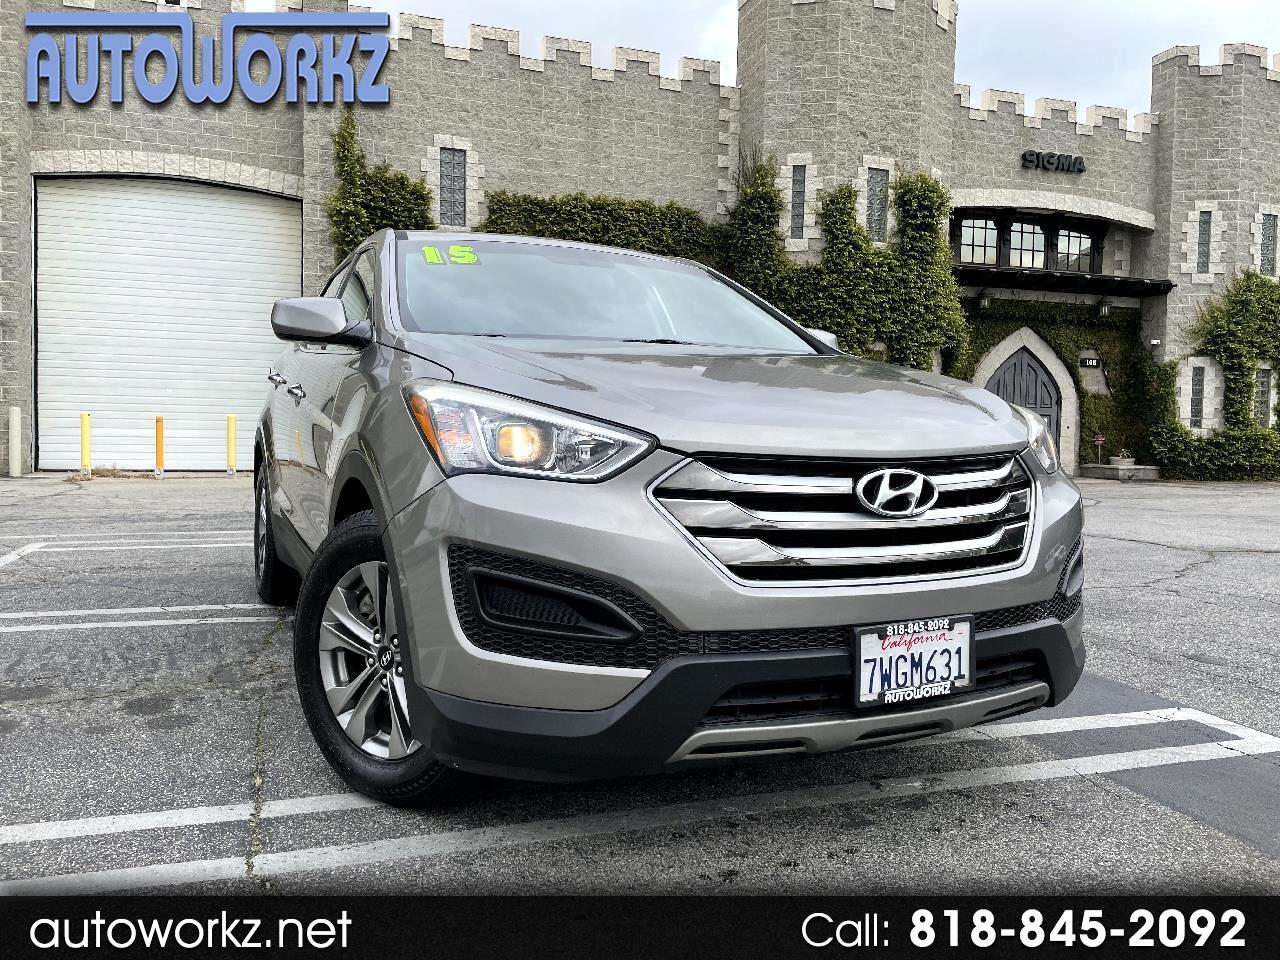 Hyundai Santa Fe Sport FWD 4dr 2.4 2015